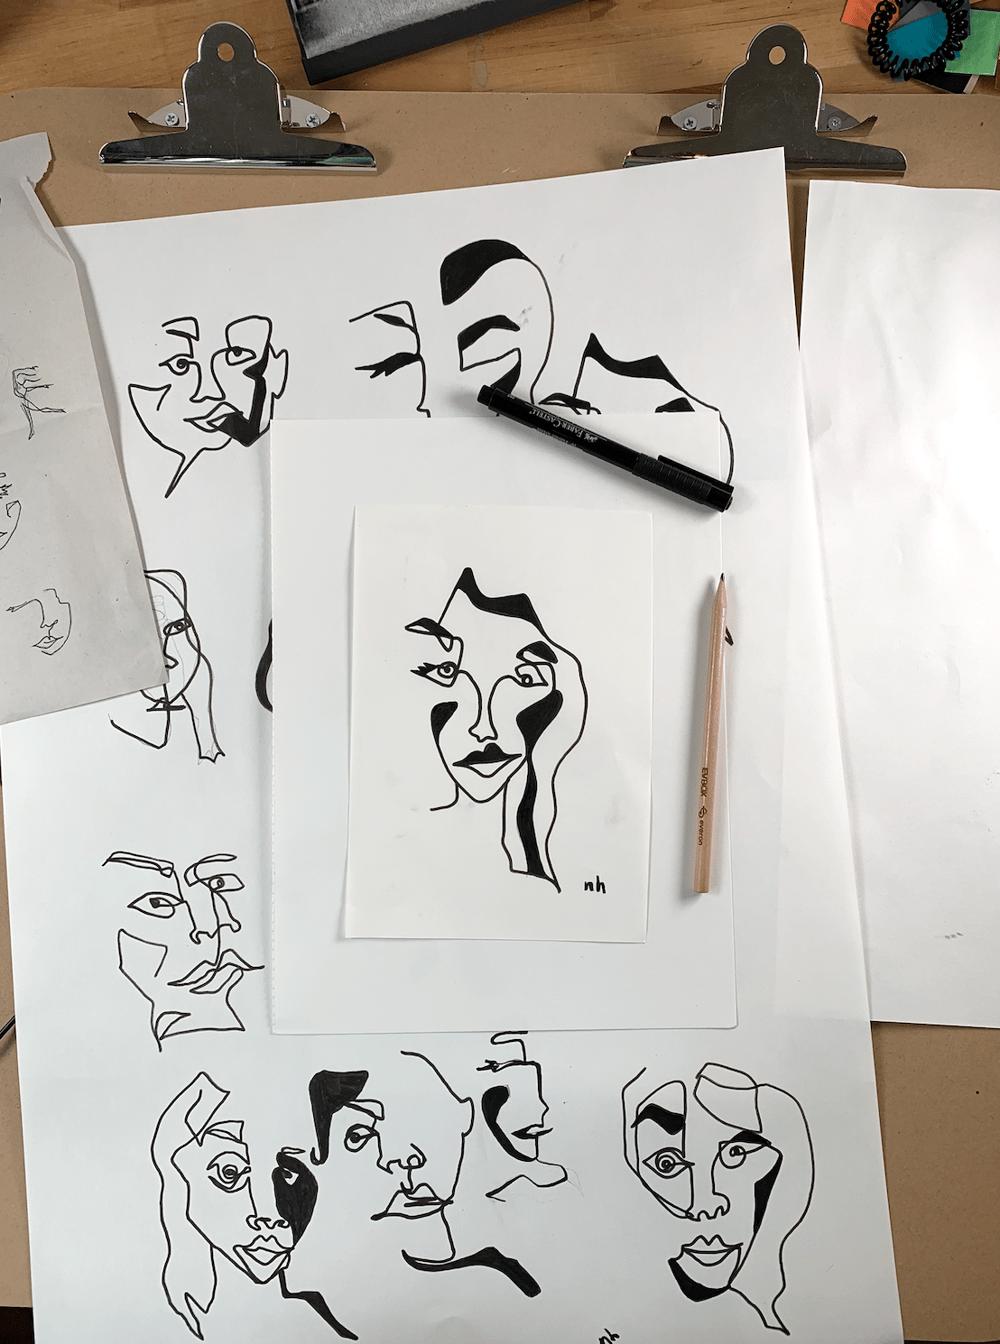 Graphic contour self portraits - image 2 - student project